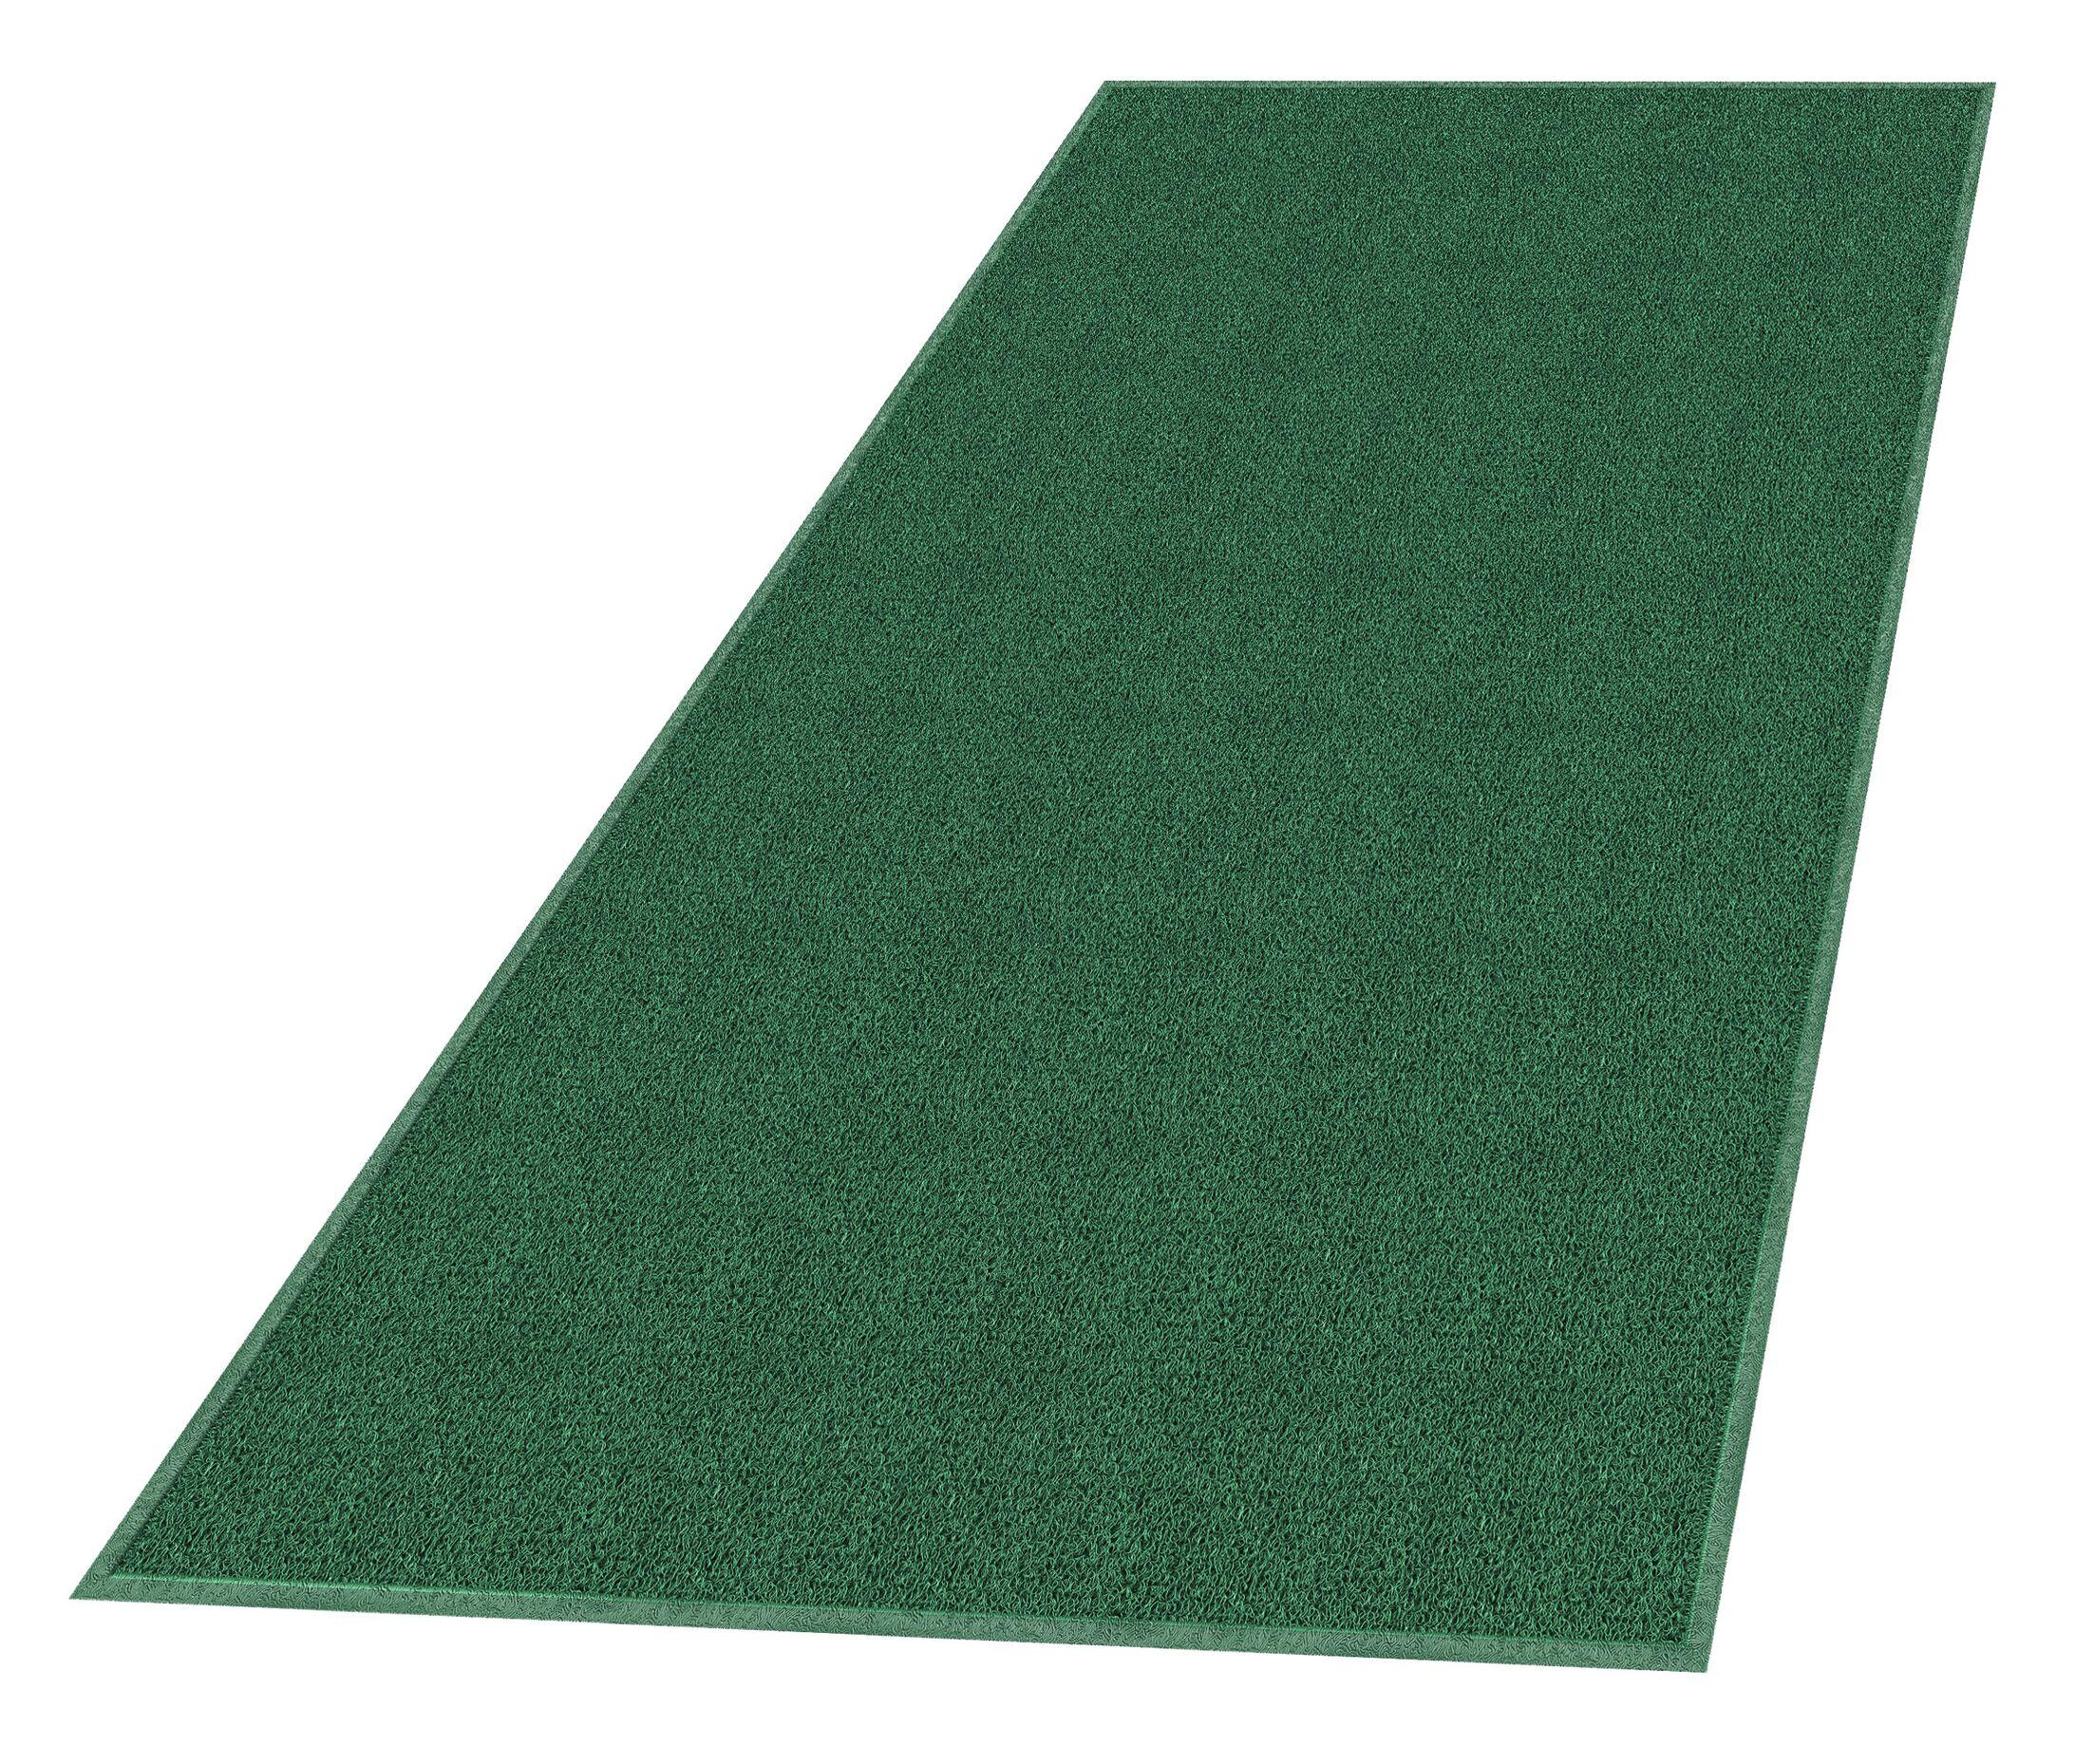 Solid Doormat Mat Size: Rectangle 4' x 6', Color: Leaf Green